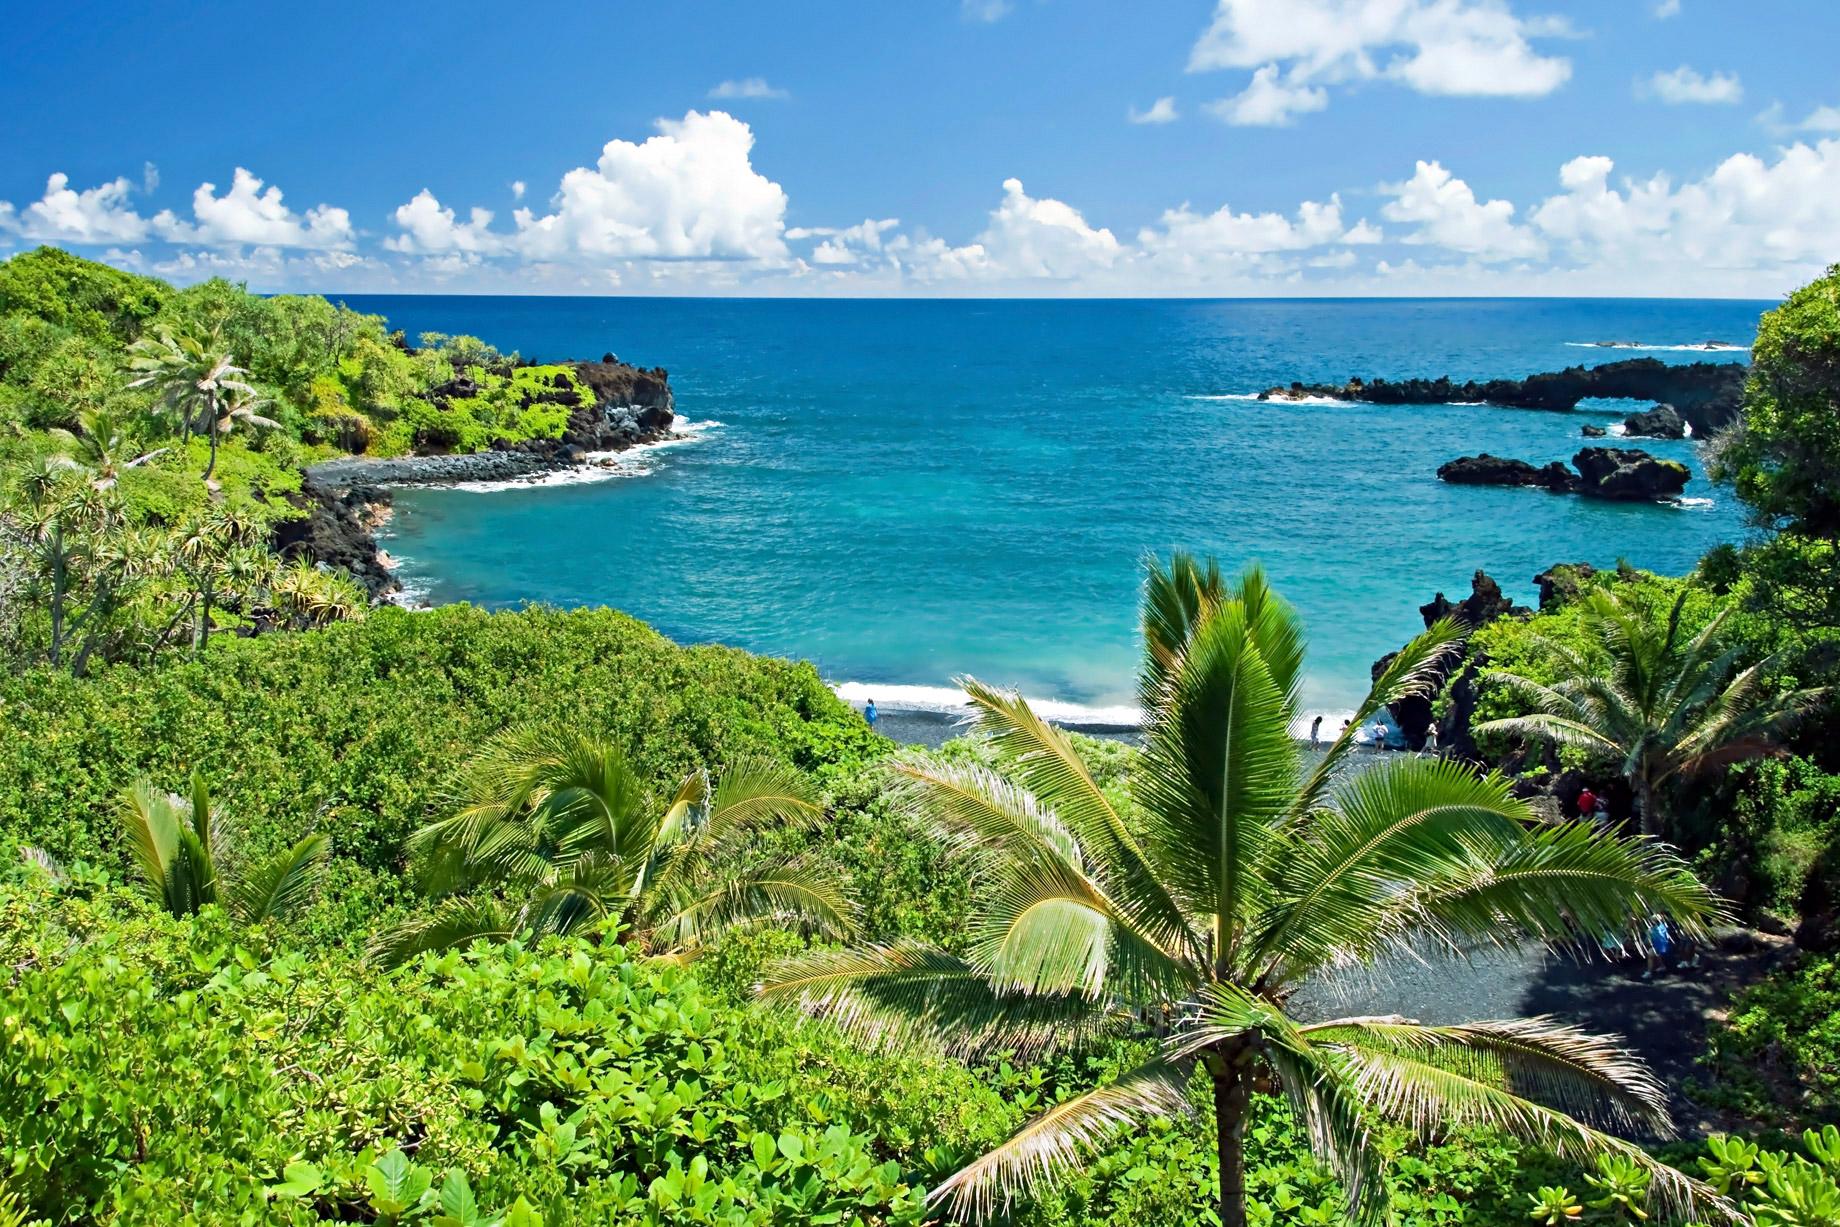 Waianapanapa State Park - Hana, Hawaii, USA - Top 10 Luxury Travel Destinations Around the World